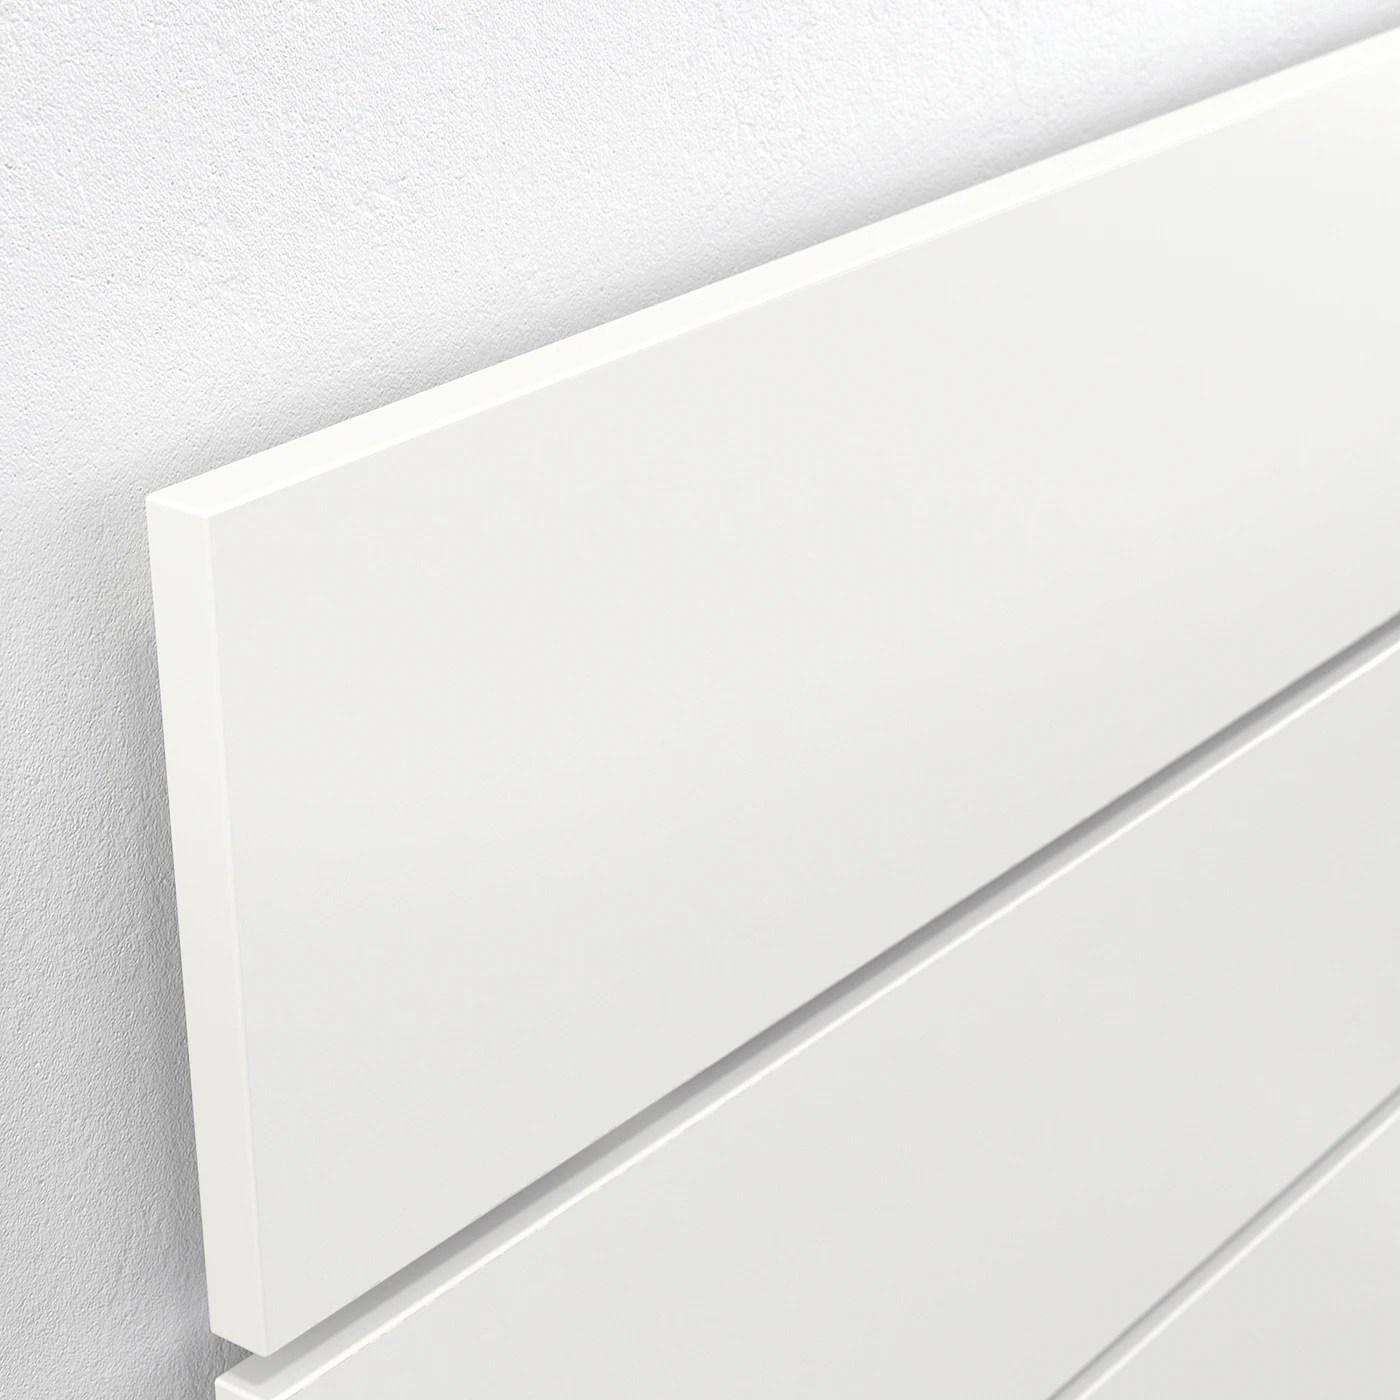 Nordli Tete De Lit Blanc 180 193 Cm Ikea